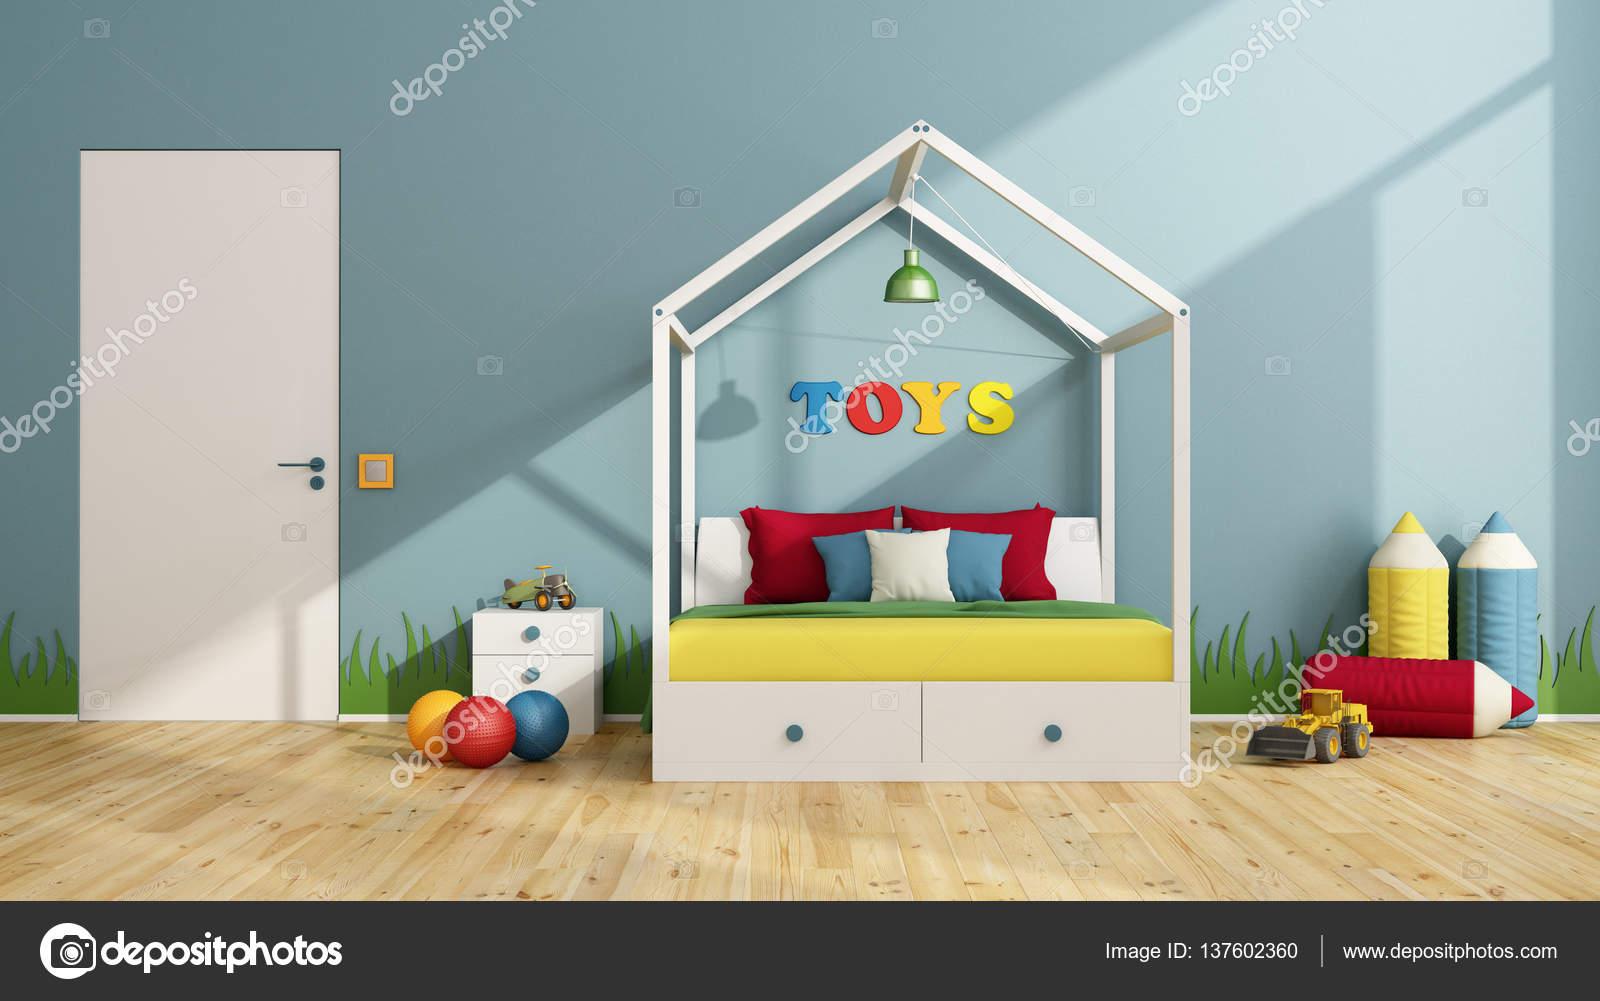 kleurrijke kinderen slaapkamer — Stockfoto © archideaphoto #137602360